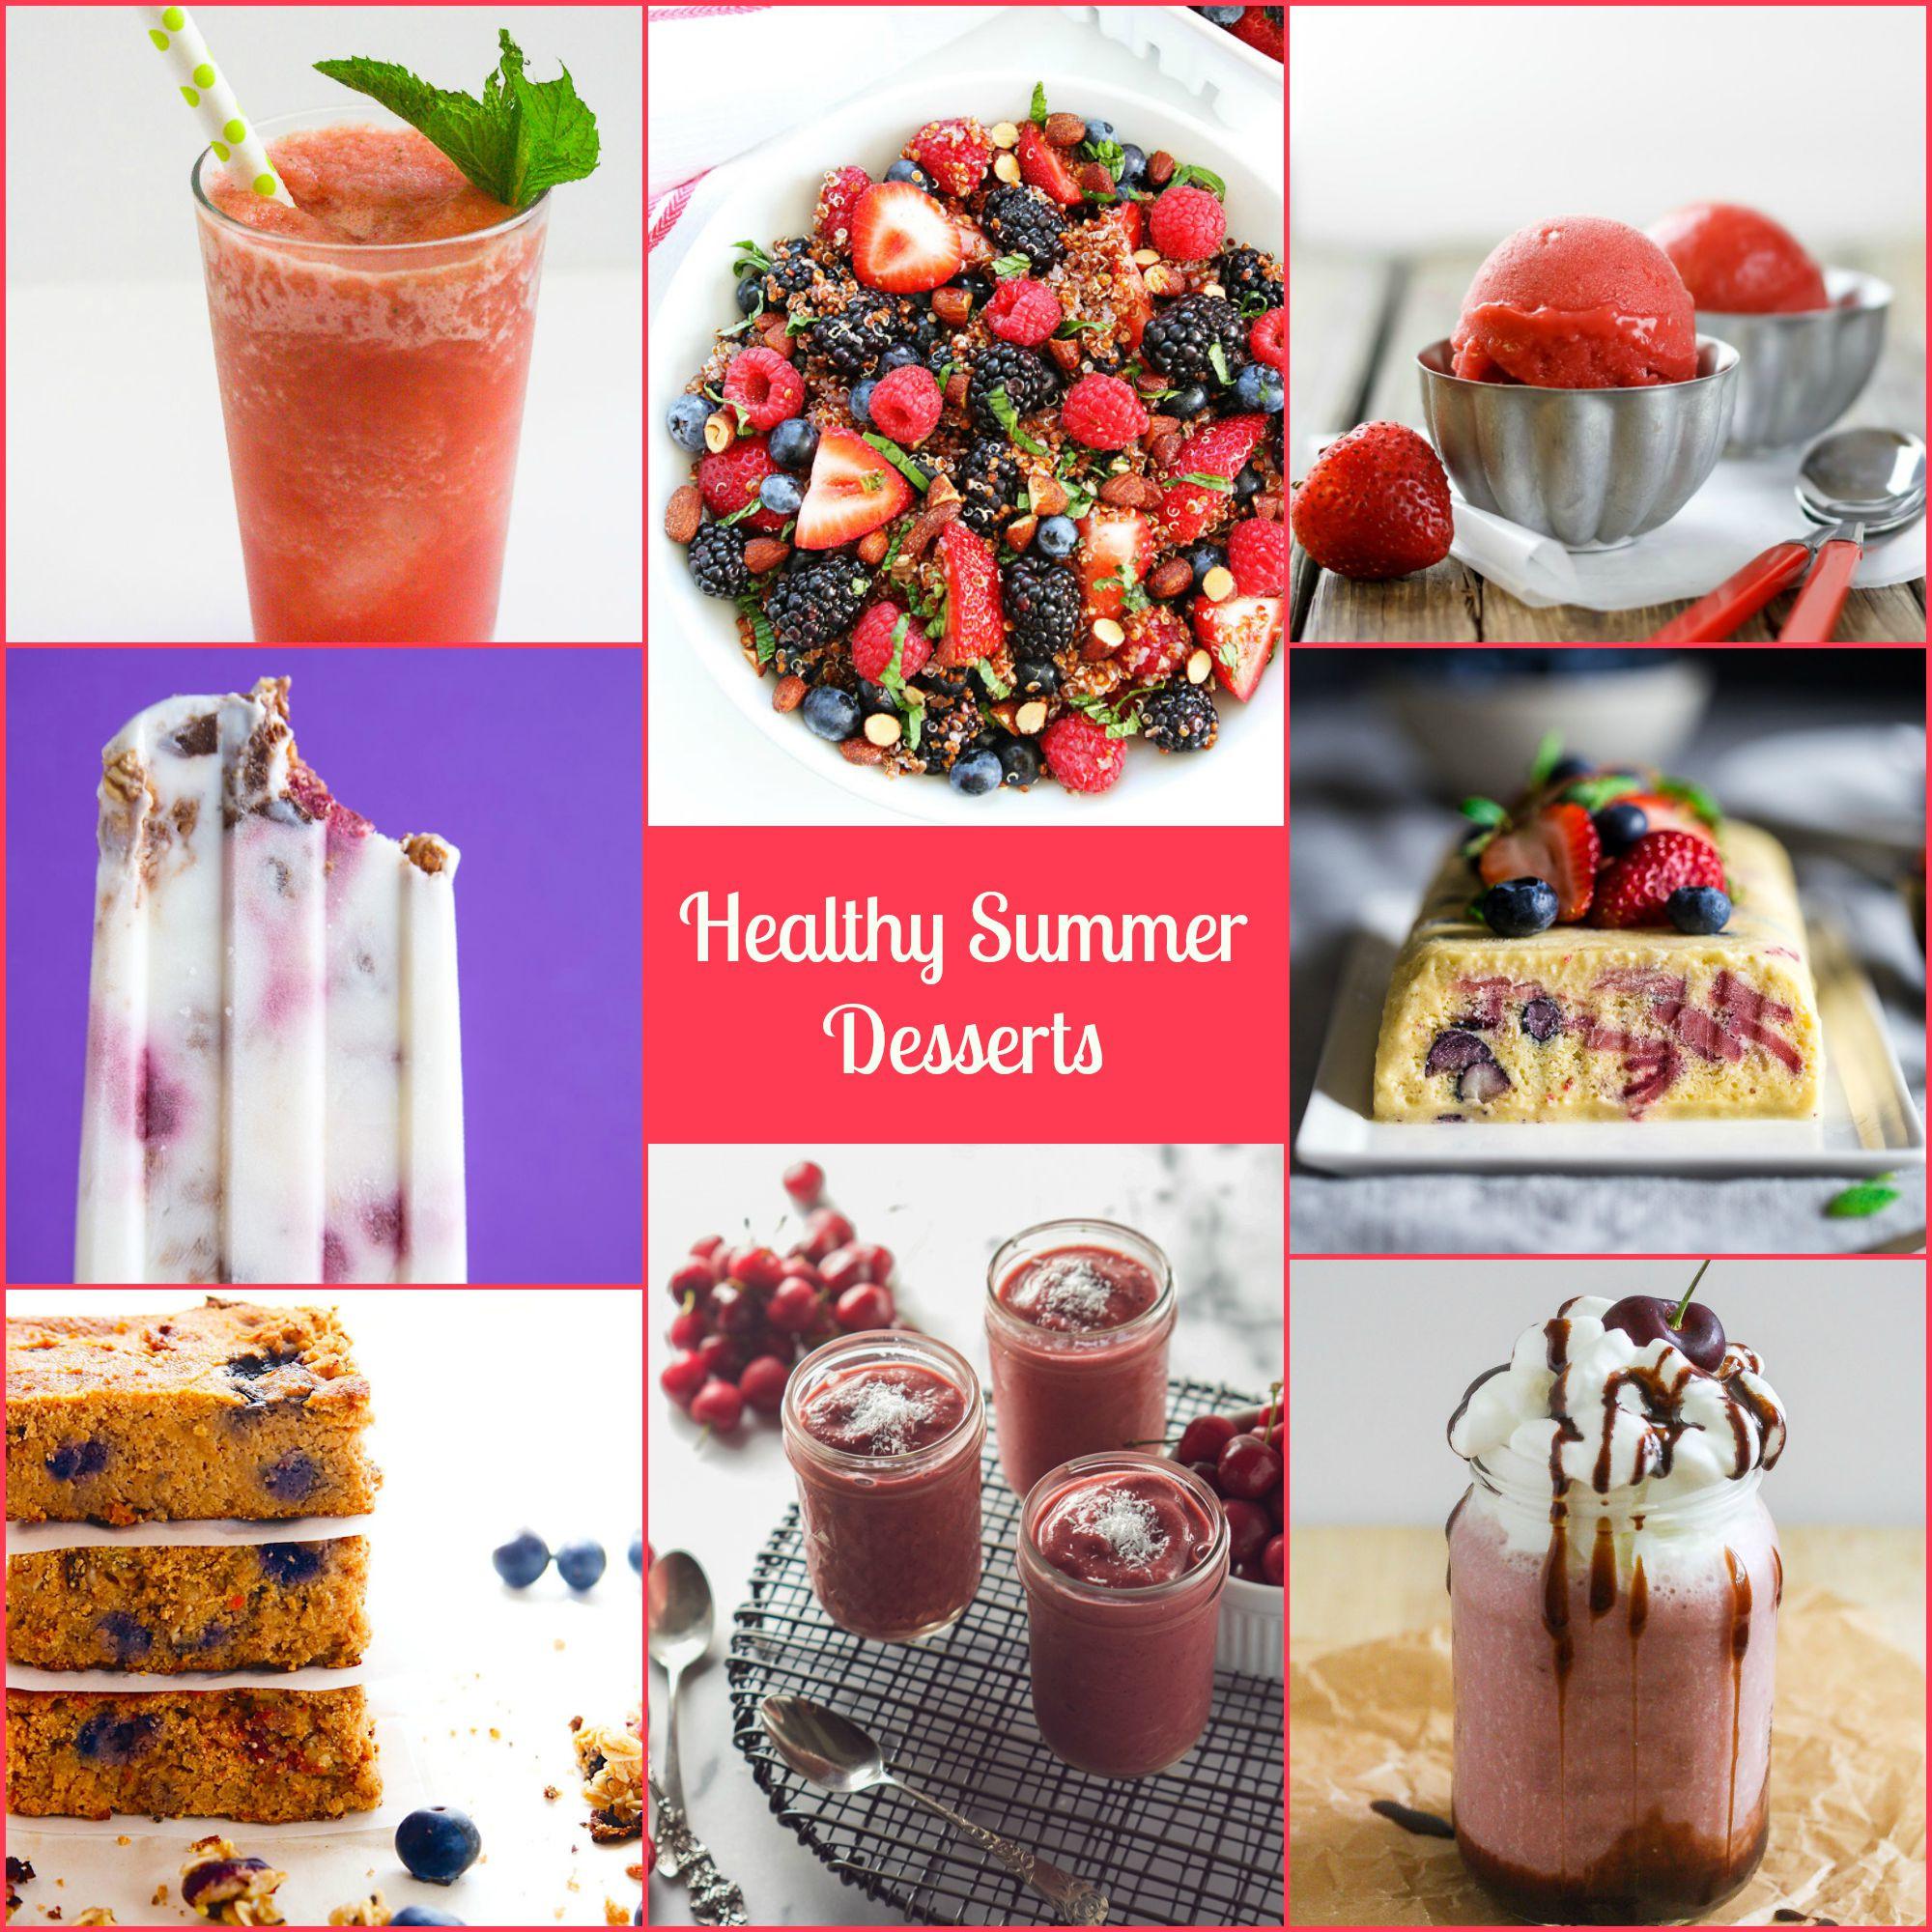 Healthy Summer Desserts  Healthy Summer Desserts